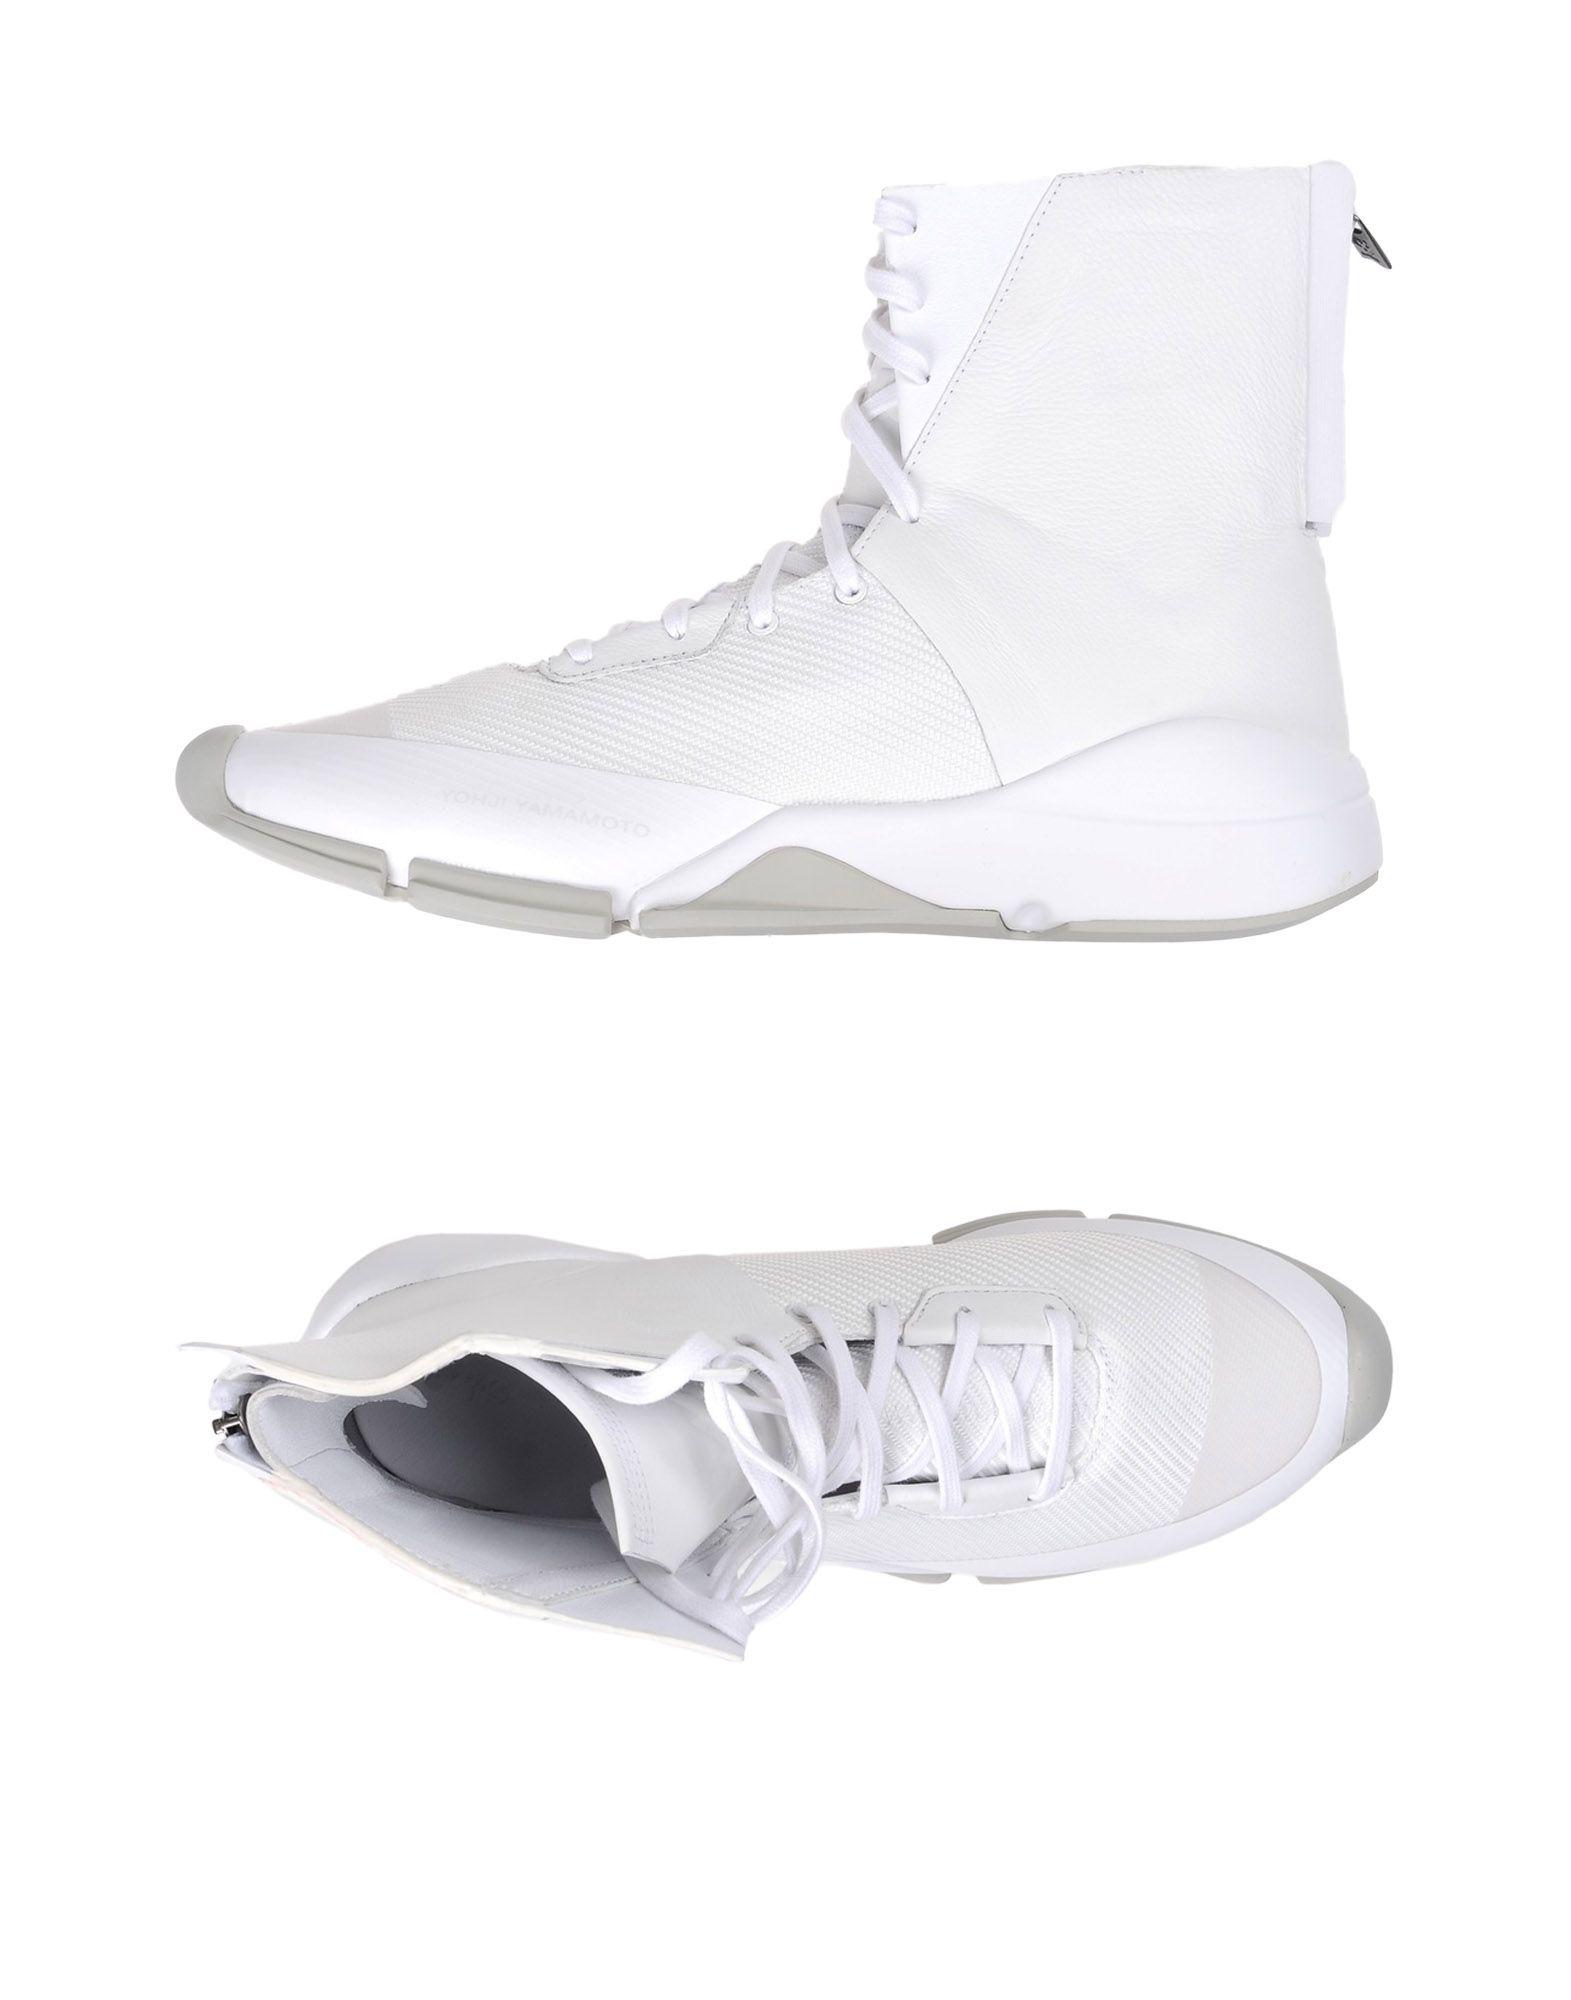 Y-3 Высокие кеды и кроссовки кеды кроссовки высокие женские dc rebound hi chambray page 3